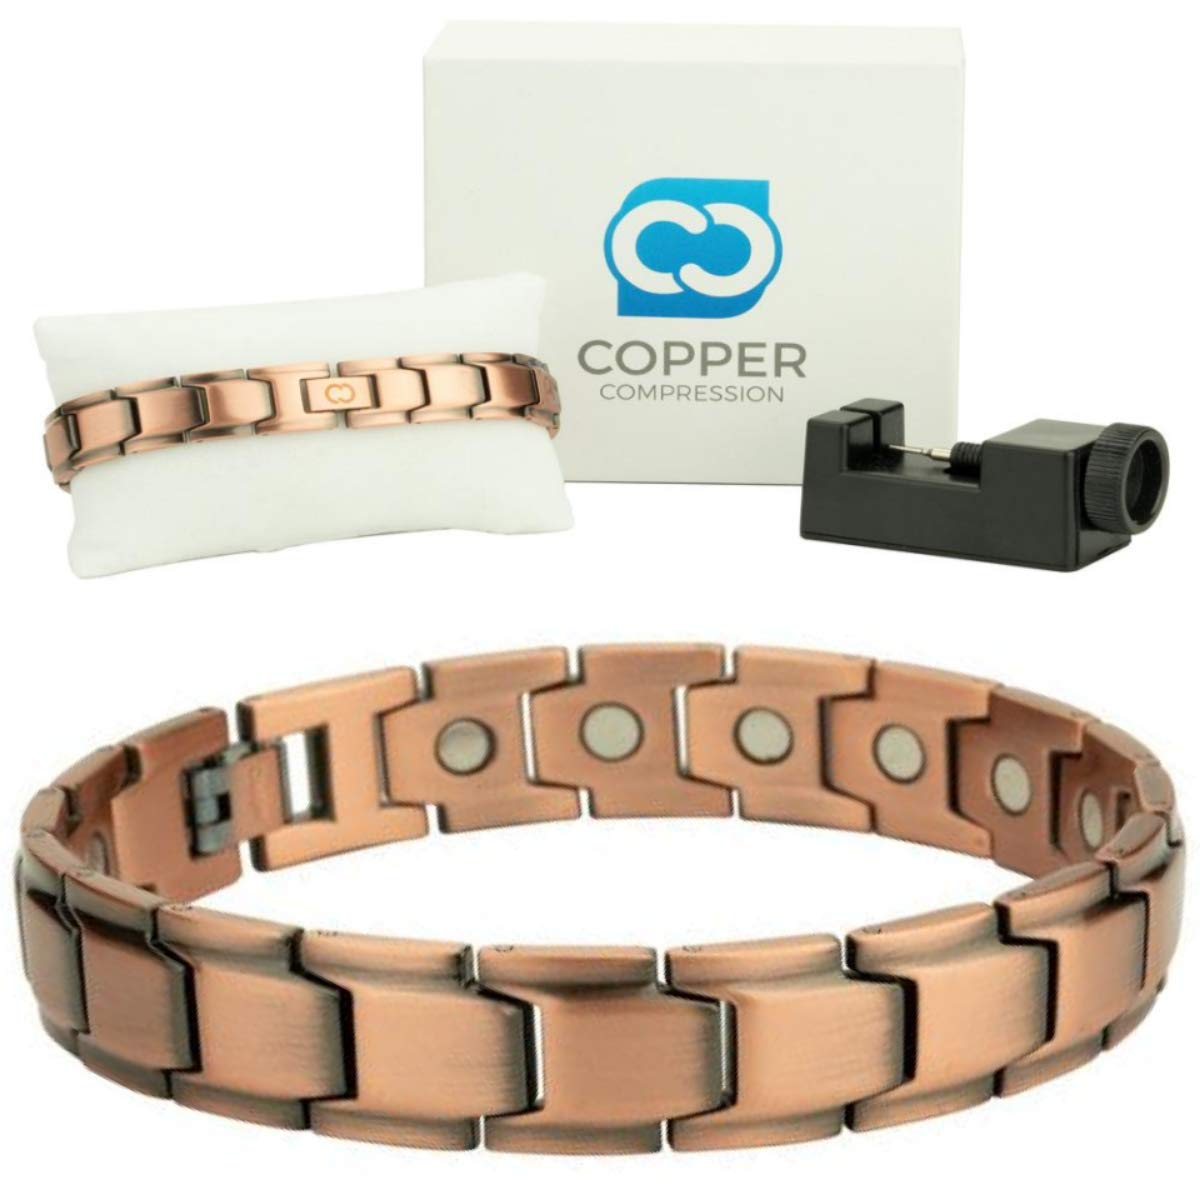 Copper Compression Elegant Luxury Copper Bracelet for Arthritis - 99.9% Pure Copper Magnetic Therapy 18 Magnet Link Bracelet for Men + Women. Therapeutic Bracelets for Carpal Tunnel Arthritis, Golf by Copper Compression